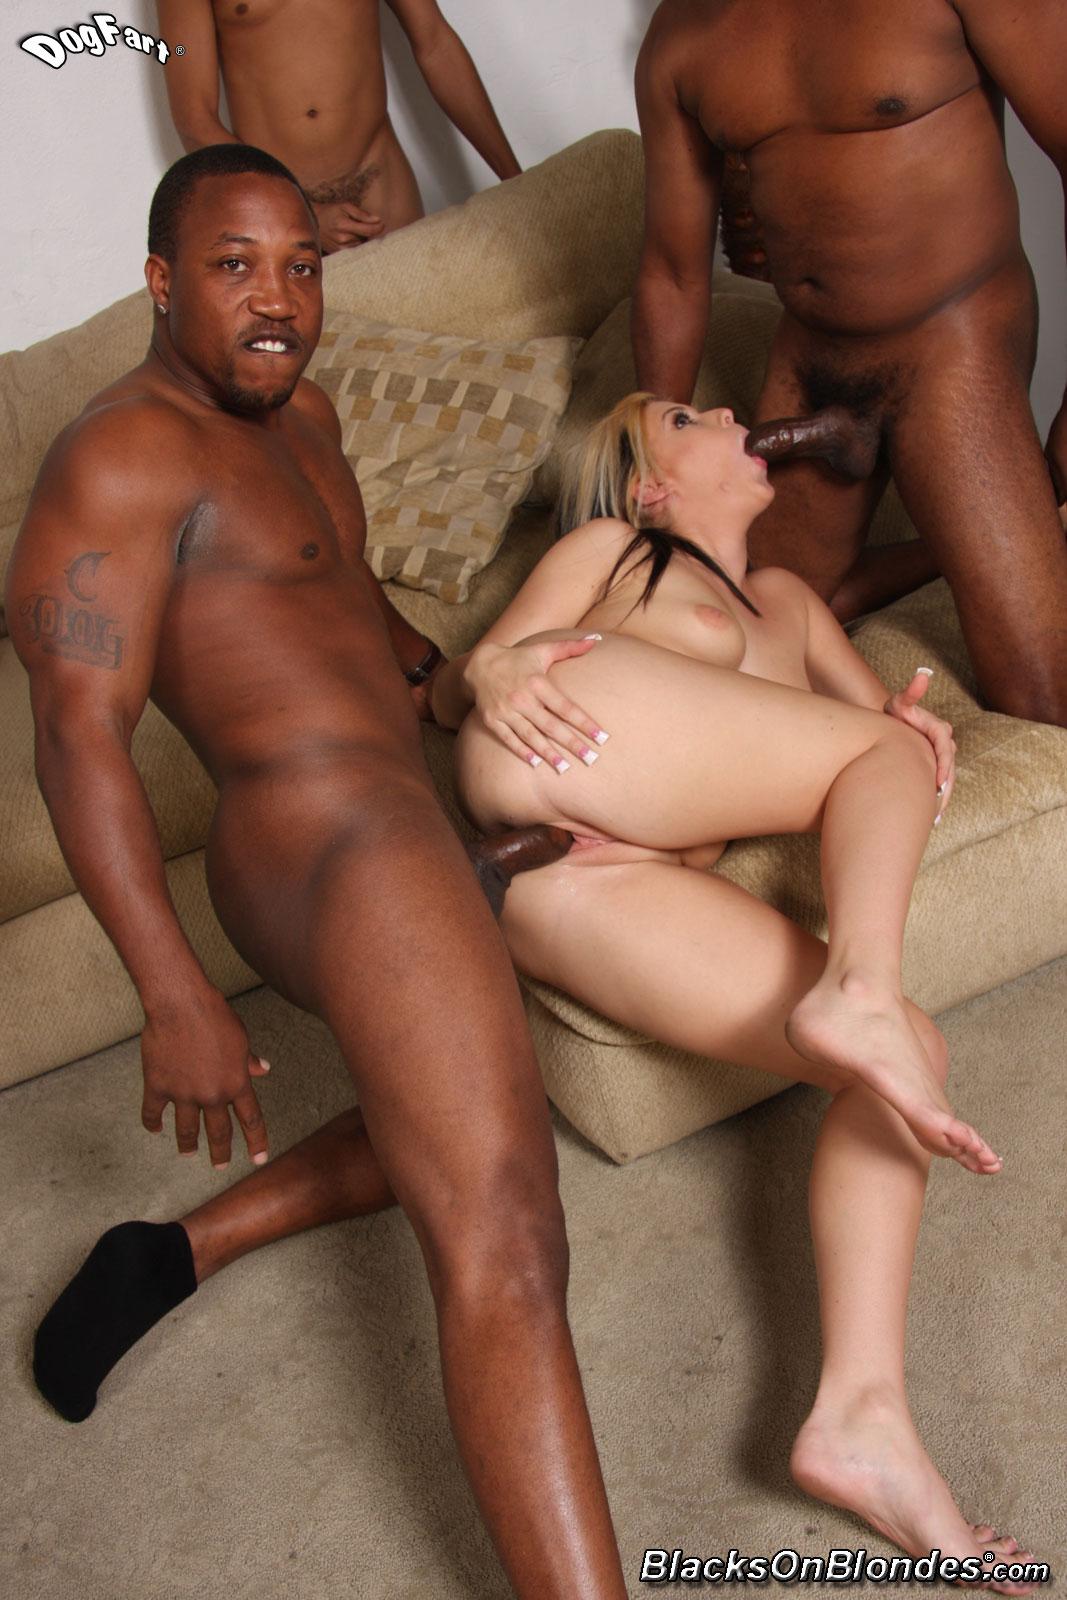 Art ebony nude photograph